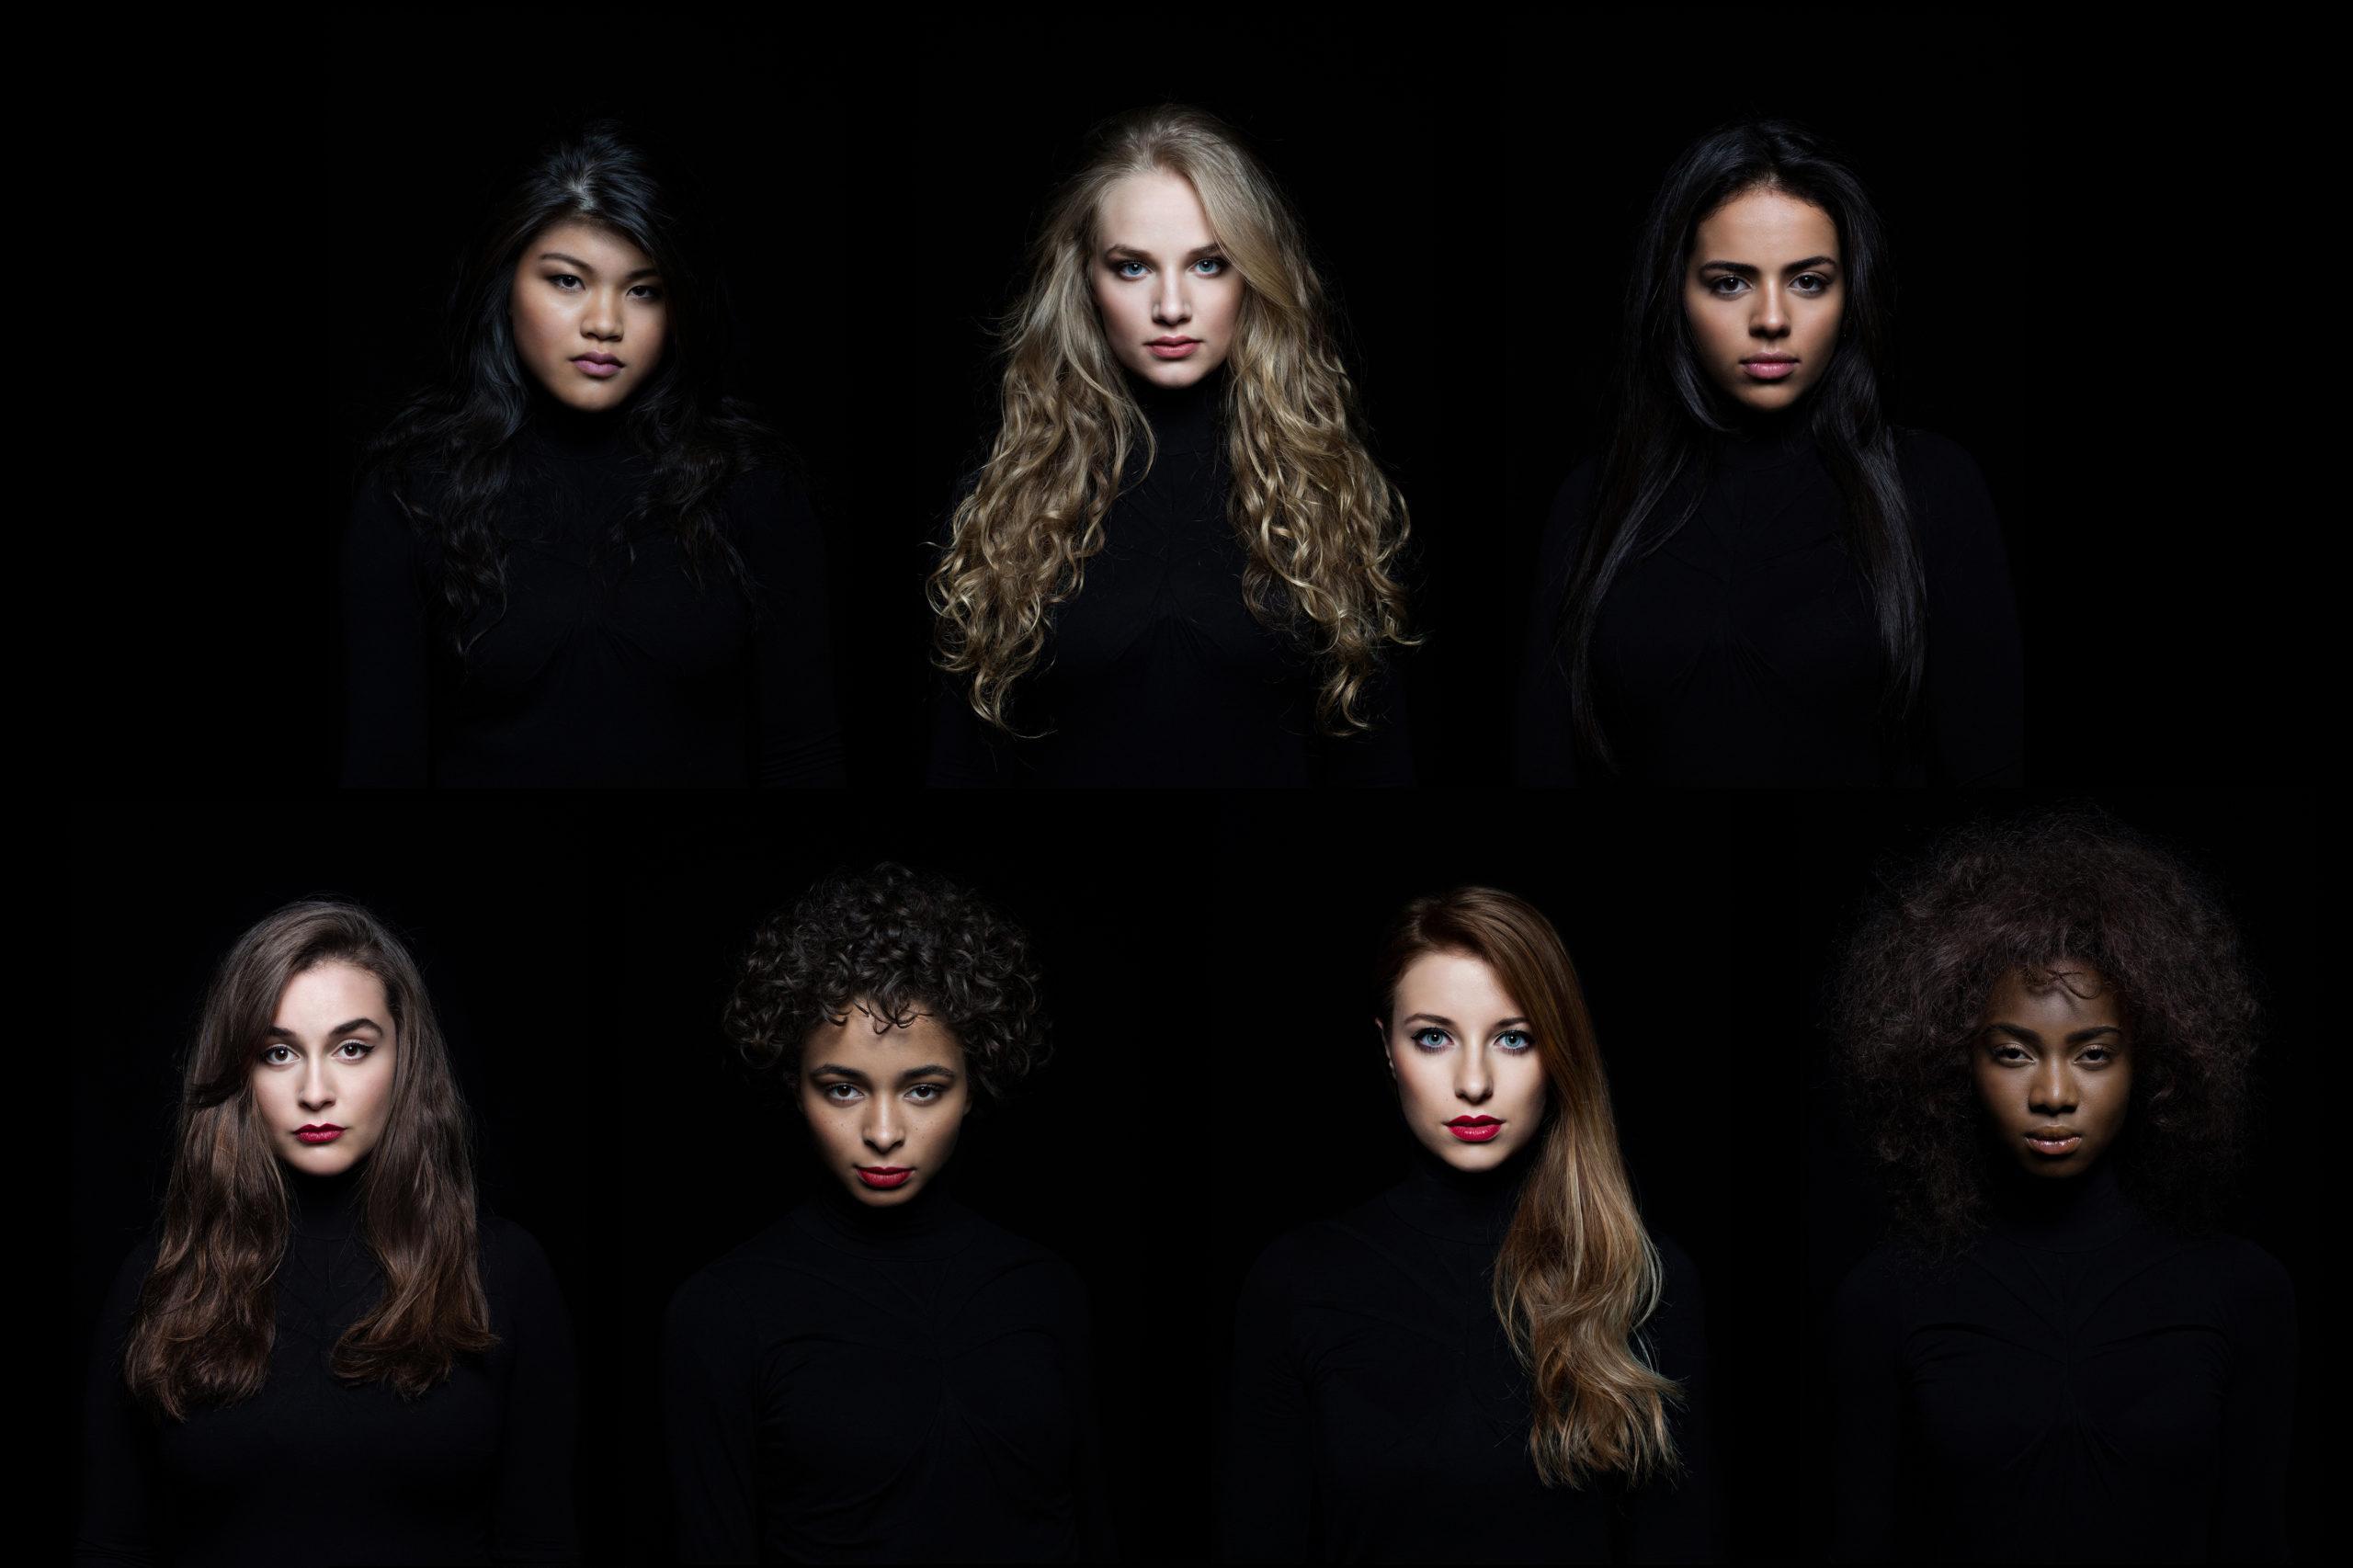 Sarah Baboro Photographe Shooting Photo Lille Portrait Mode Fashion Makeup Women